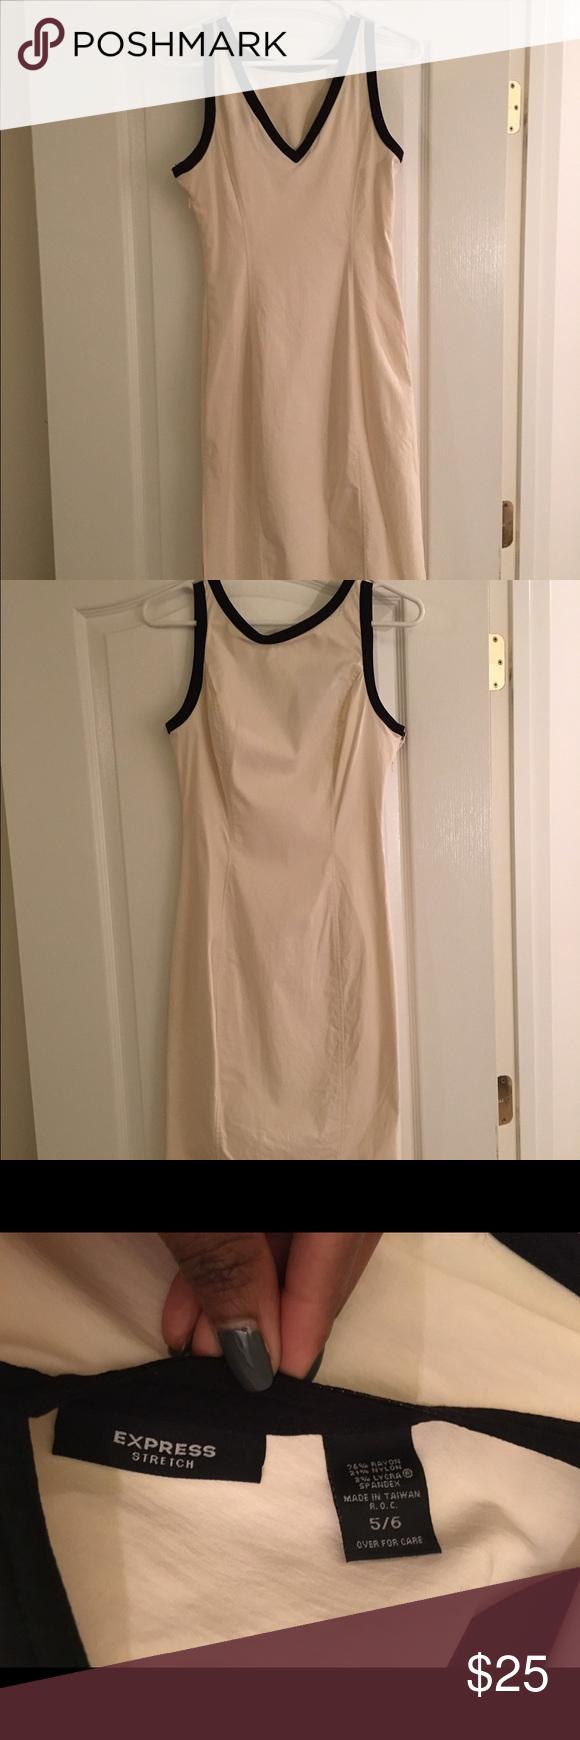 Express stretch cream dress Stretch dress size 5/6. Great condition. Express Dresses